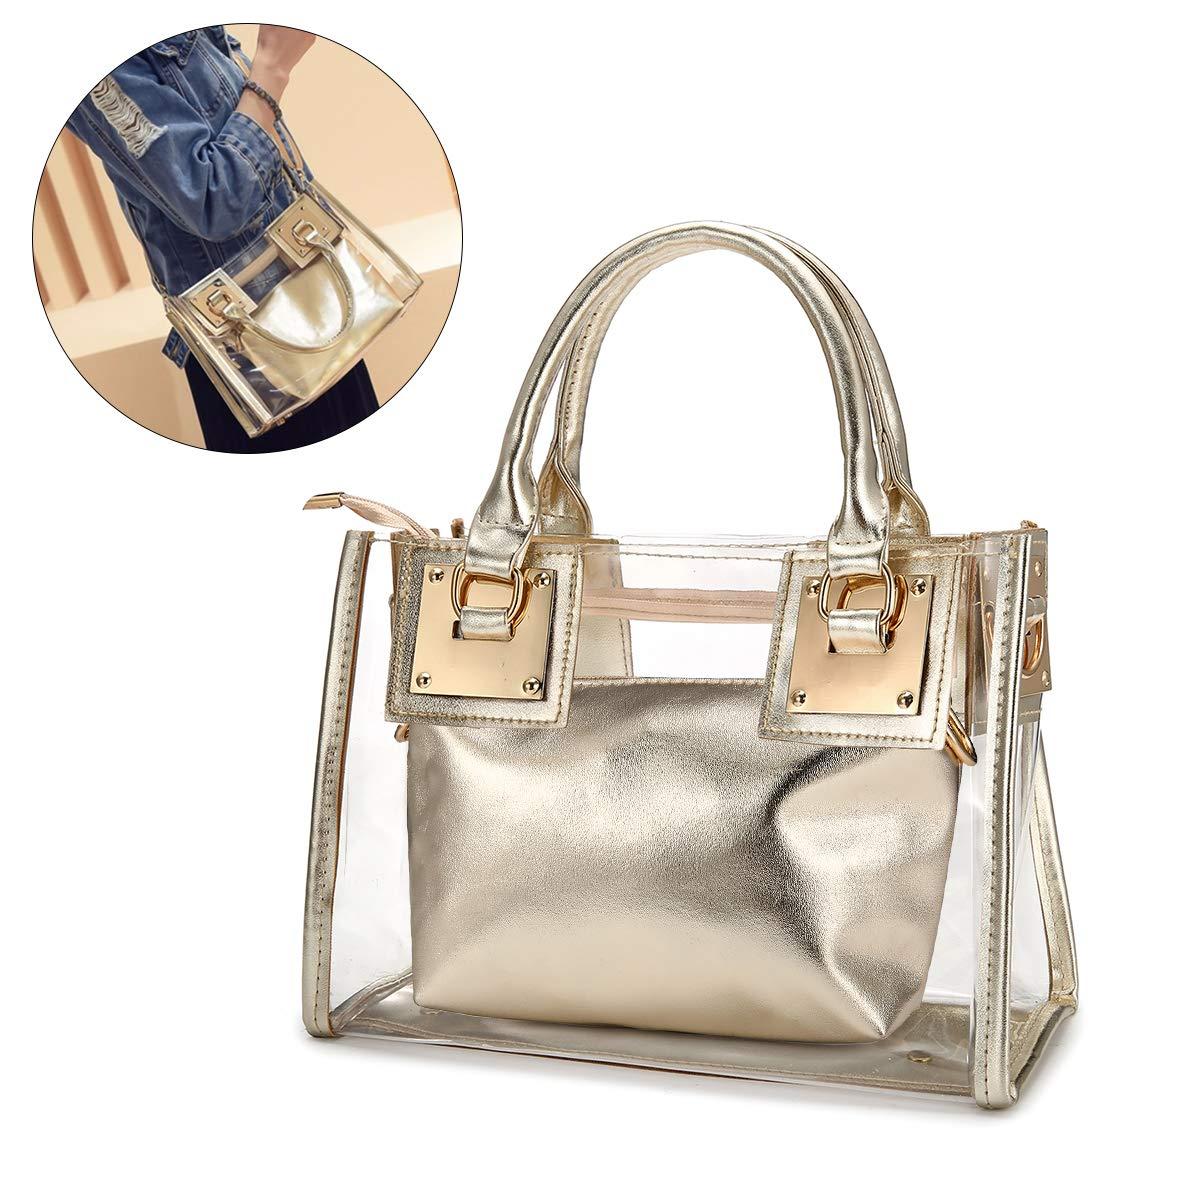 Clear Crossbody Handbags, OURBAG Fashion Women's Waterproof Clear Handbag Top Handle Shoulder Bag Transparent Purse OURBAGDrseewd3604